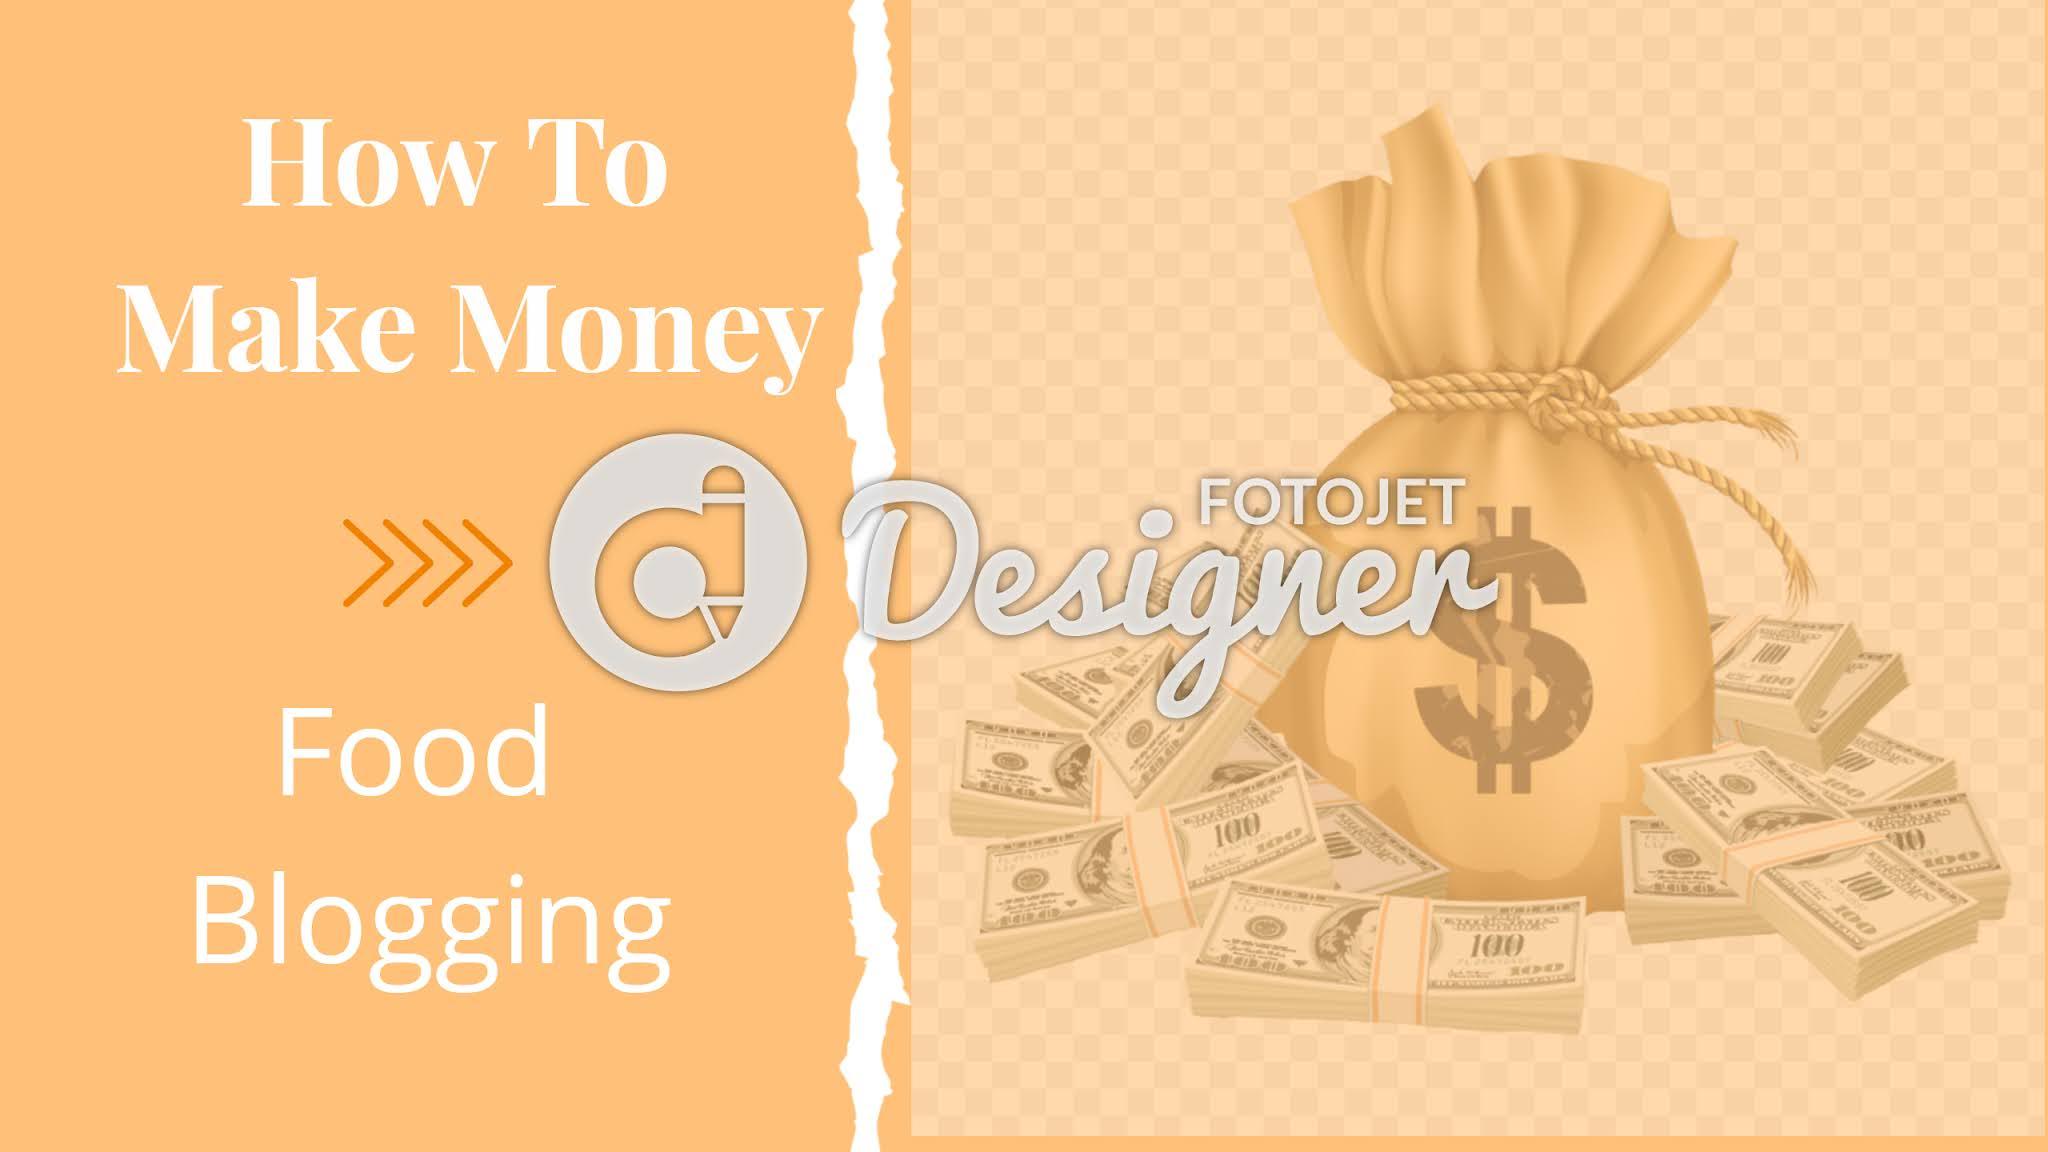 How To Make Money Food Blogging